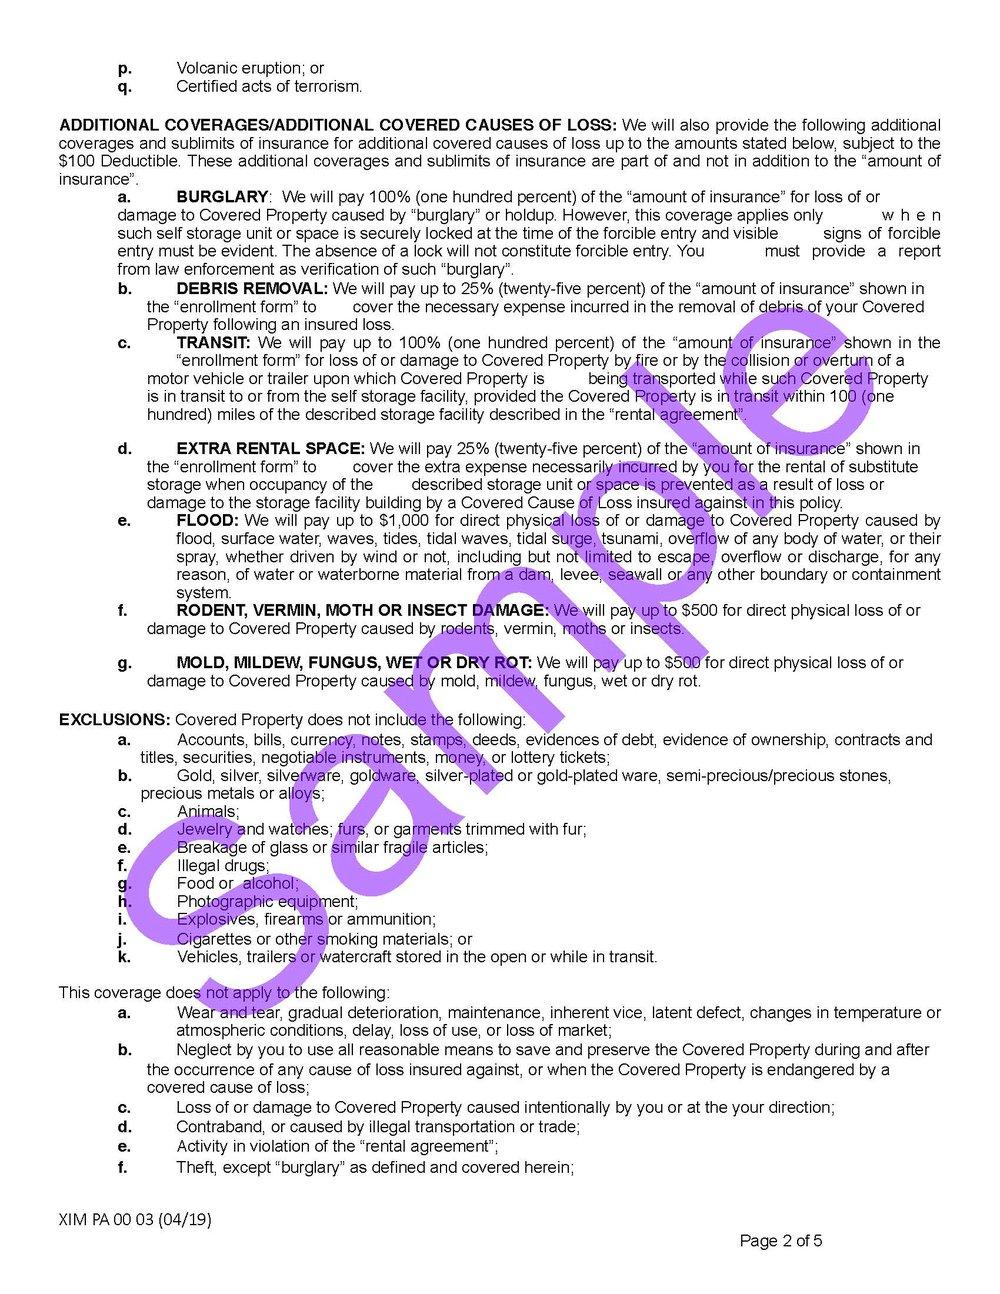 XIM PA 00 03 04 19 Pennsylvania Certificate of InsuranceSample_Page_2.jpg